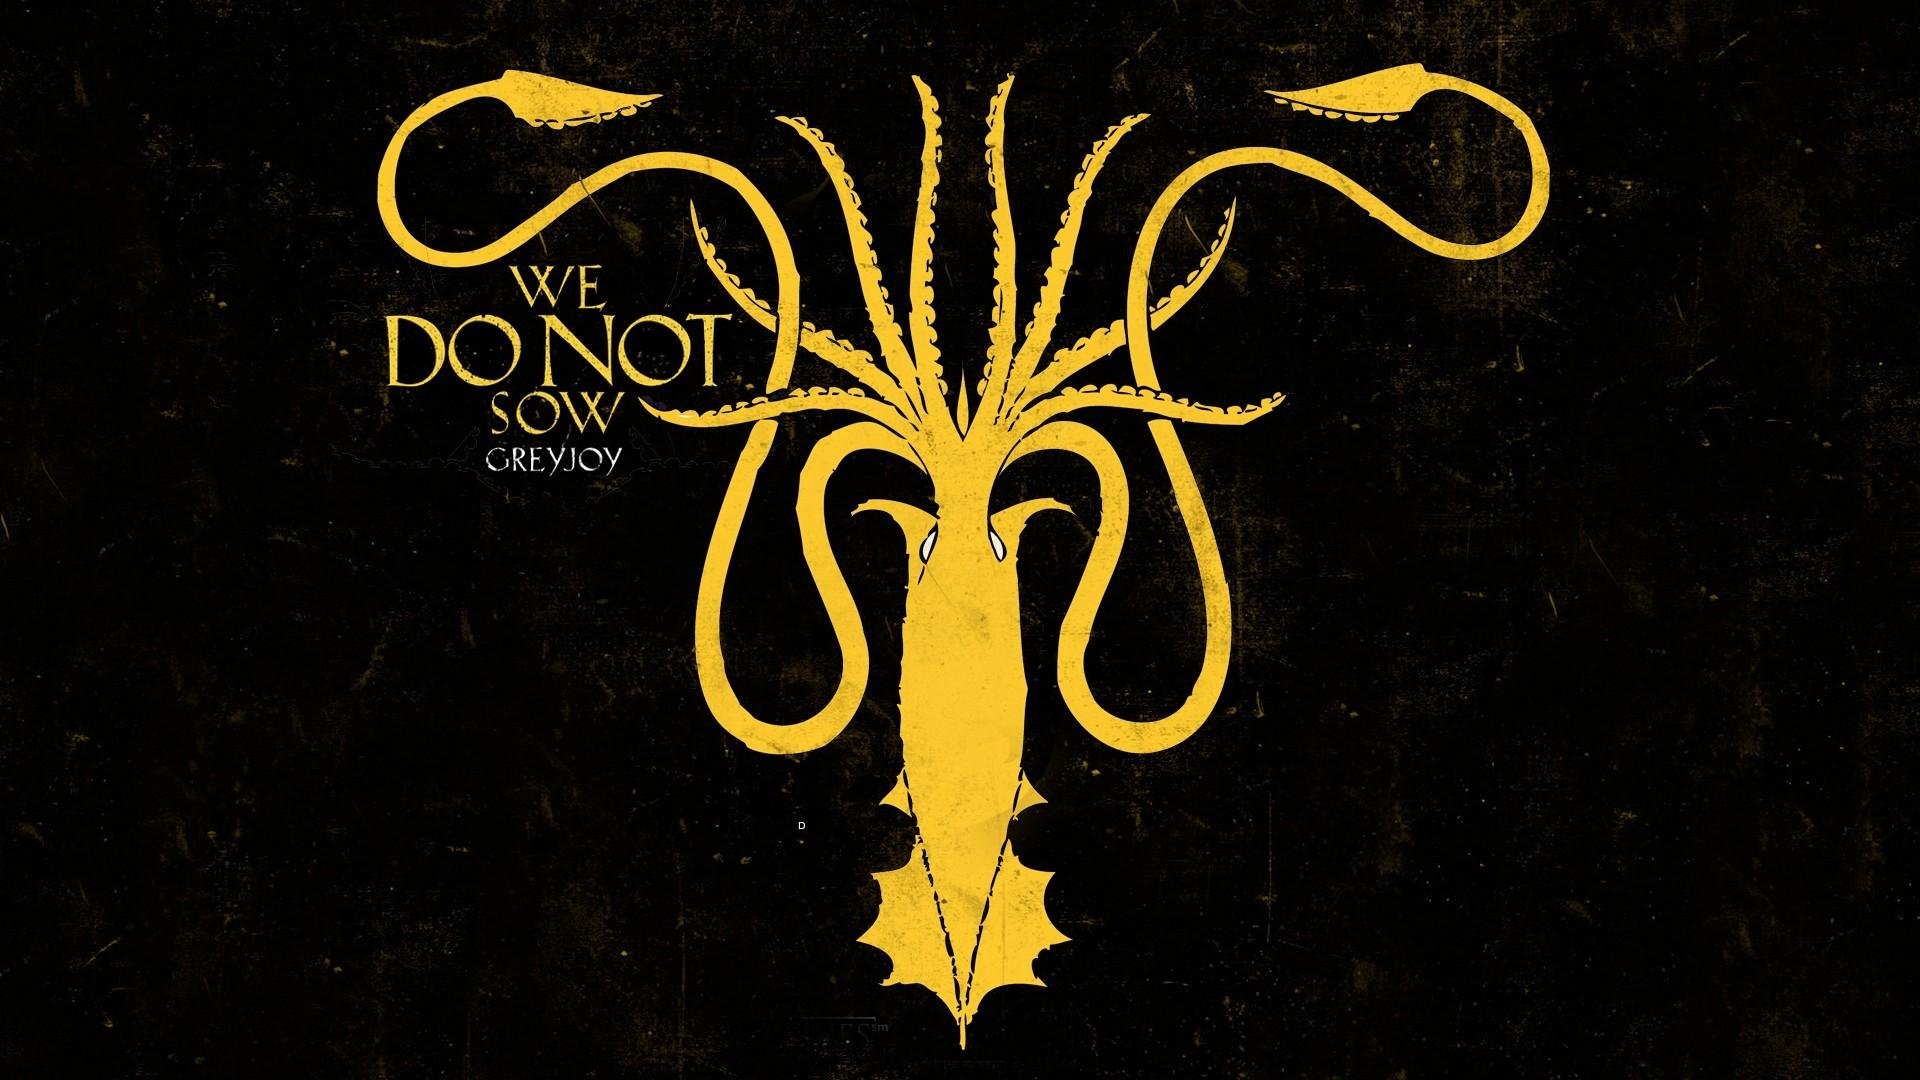 squid Game of Thrones House Greyjoy wallpaper